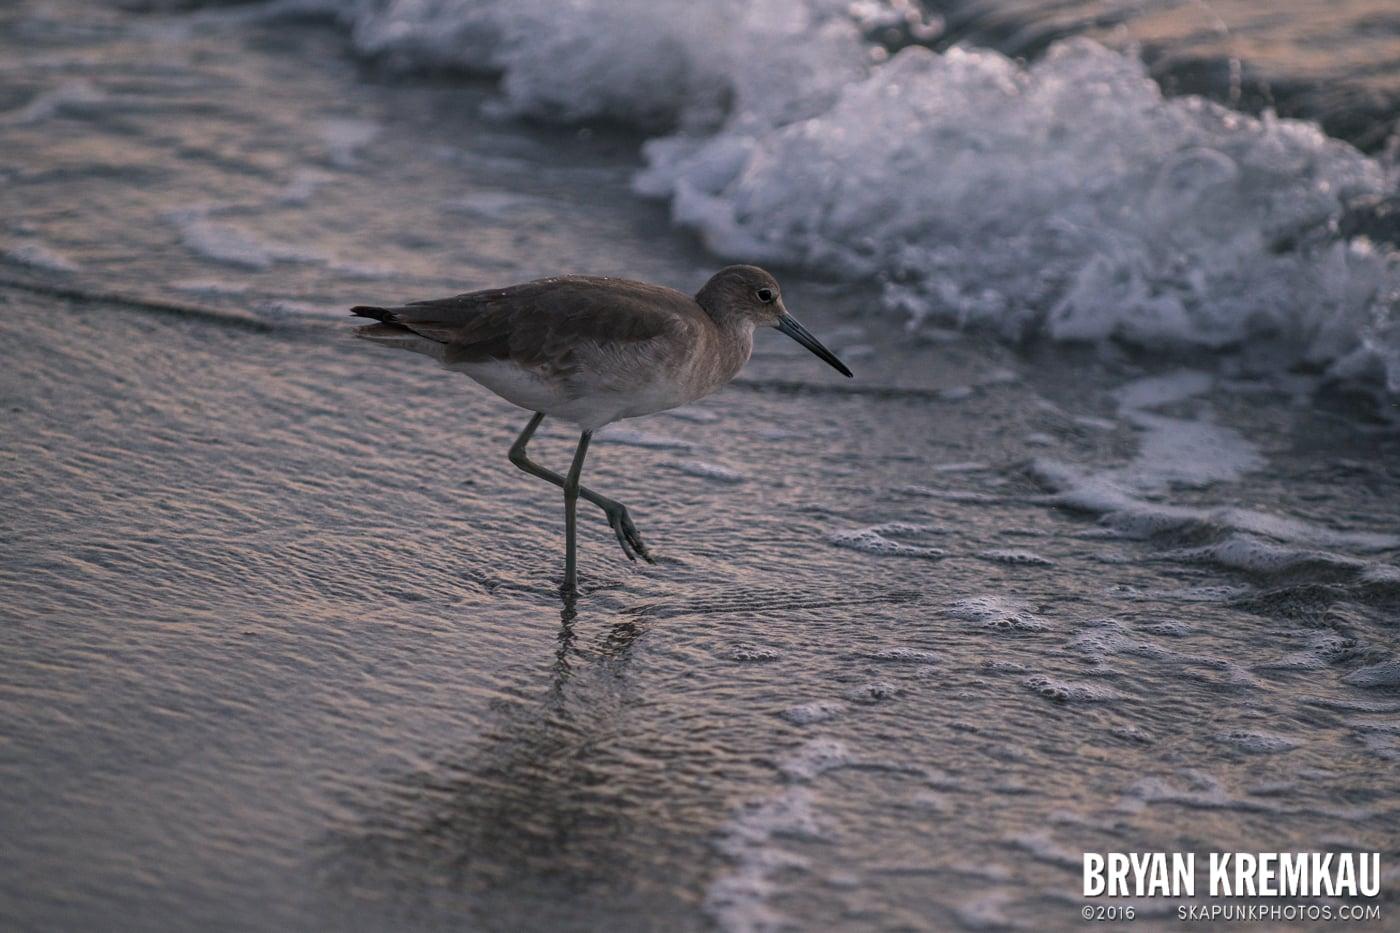 Sunsets, Astrophotography & Birds @ Venice, Florida - 10.25.14 - 11.5.14 (114)